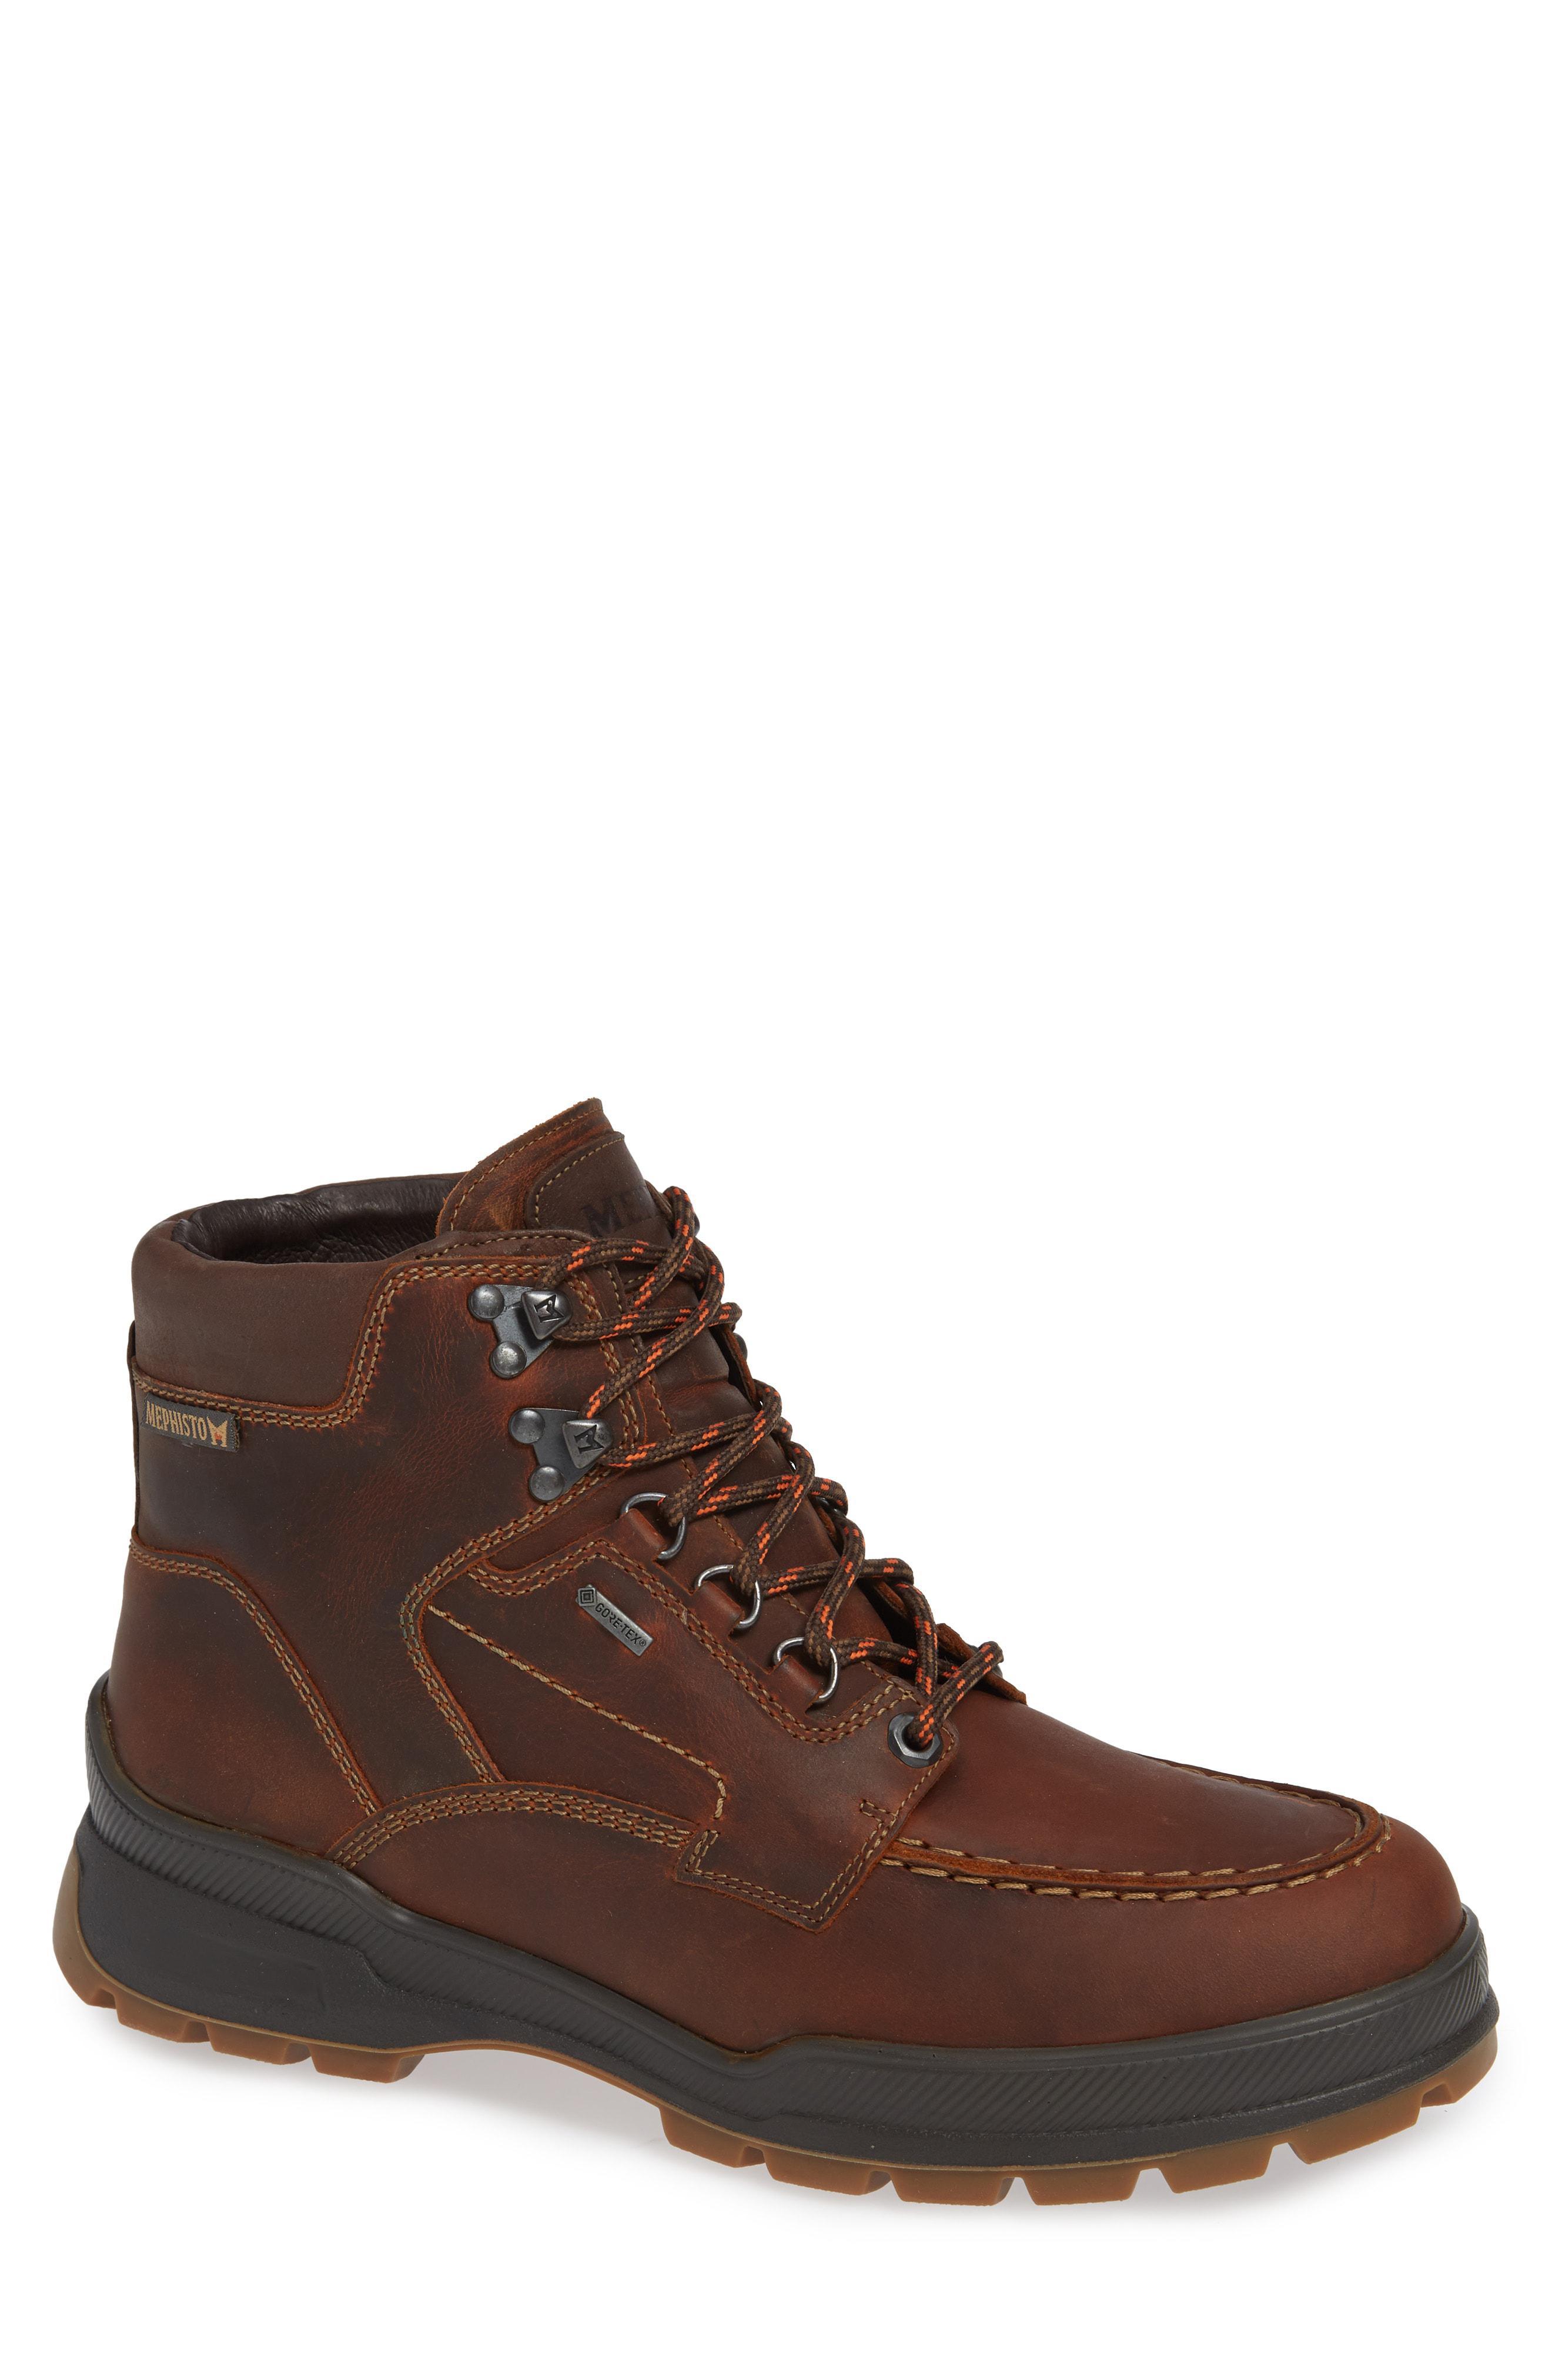 39e29de30a Mephisto Ivan Gore-tex Moc Toe Waterproof Boot in Brown for Men - Lyst